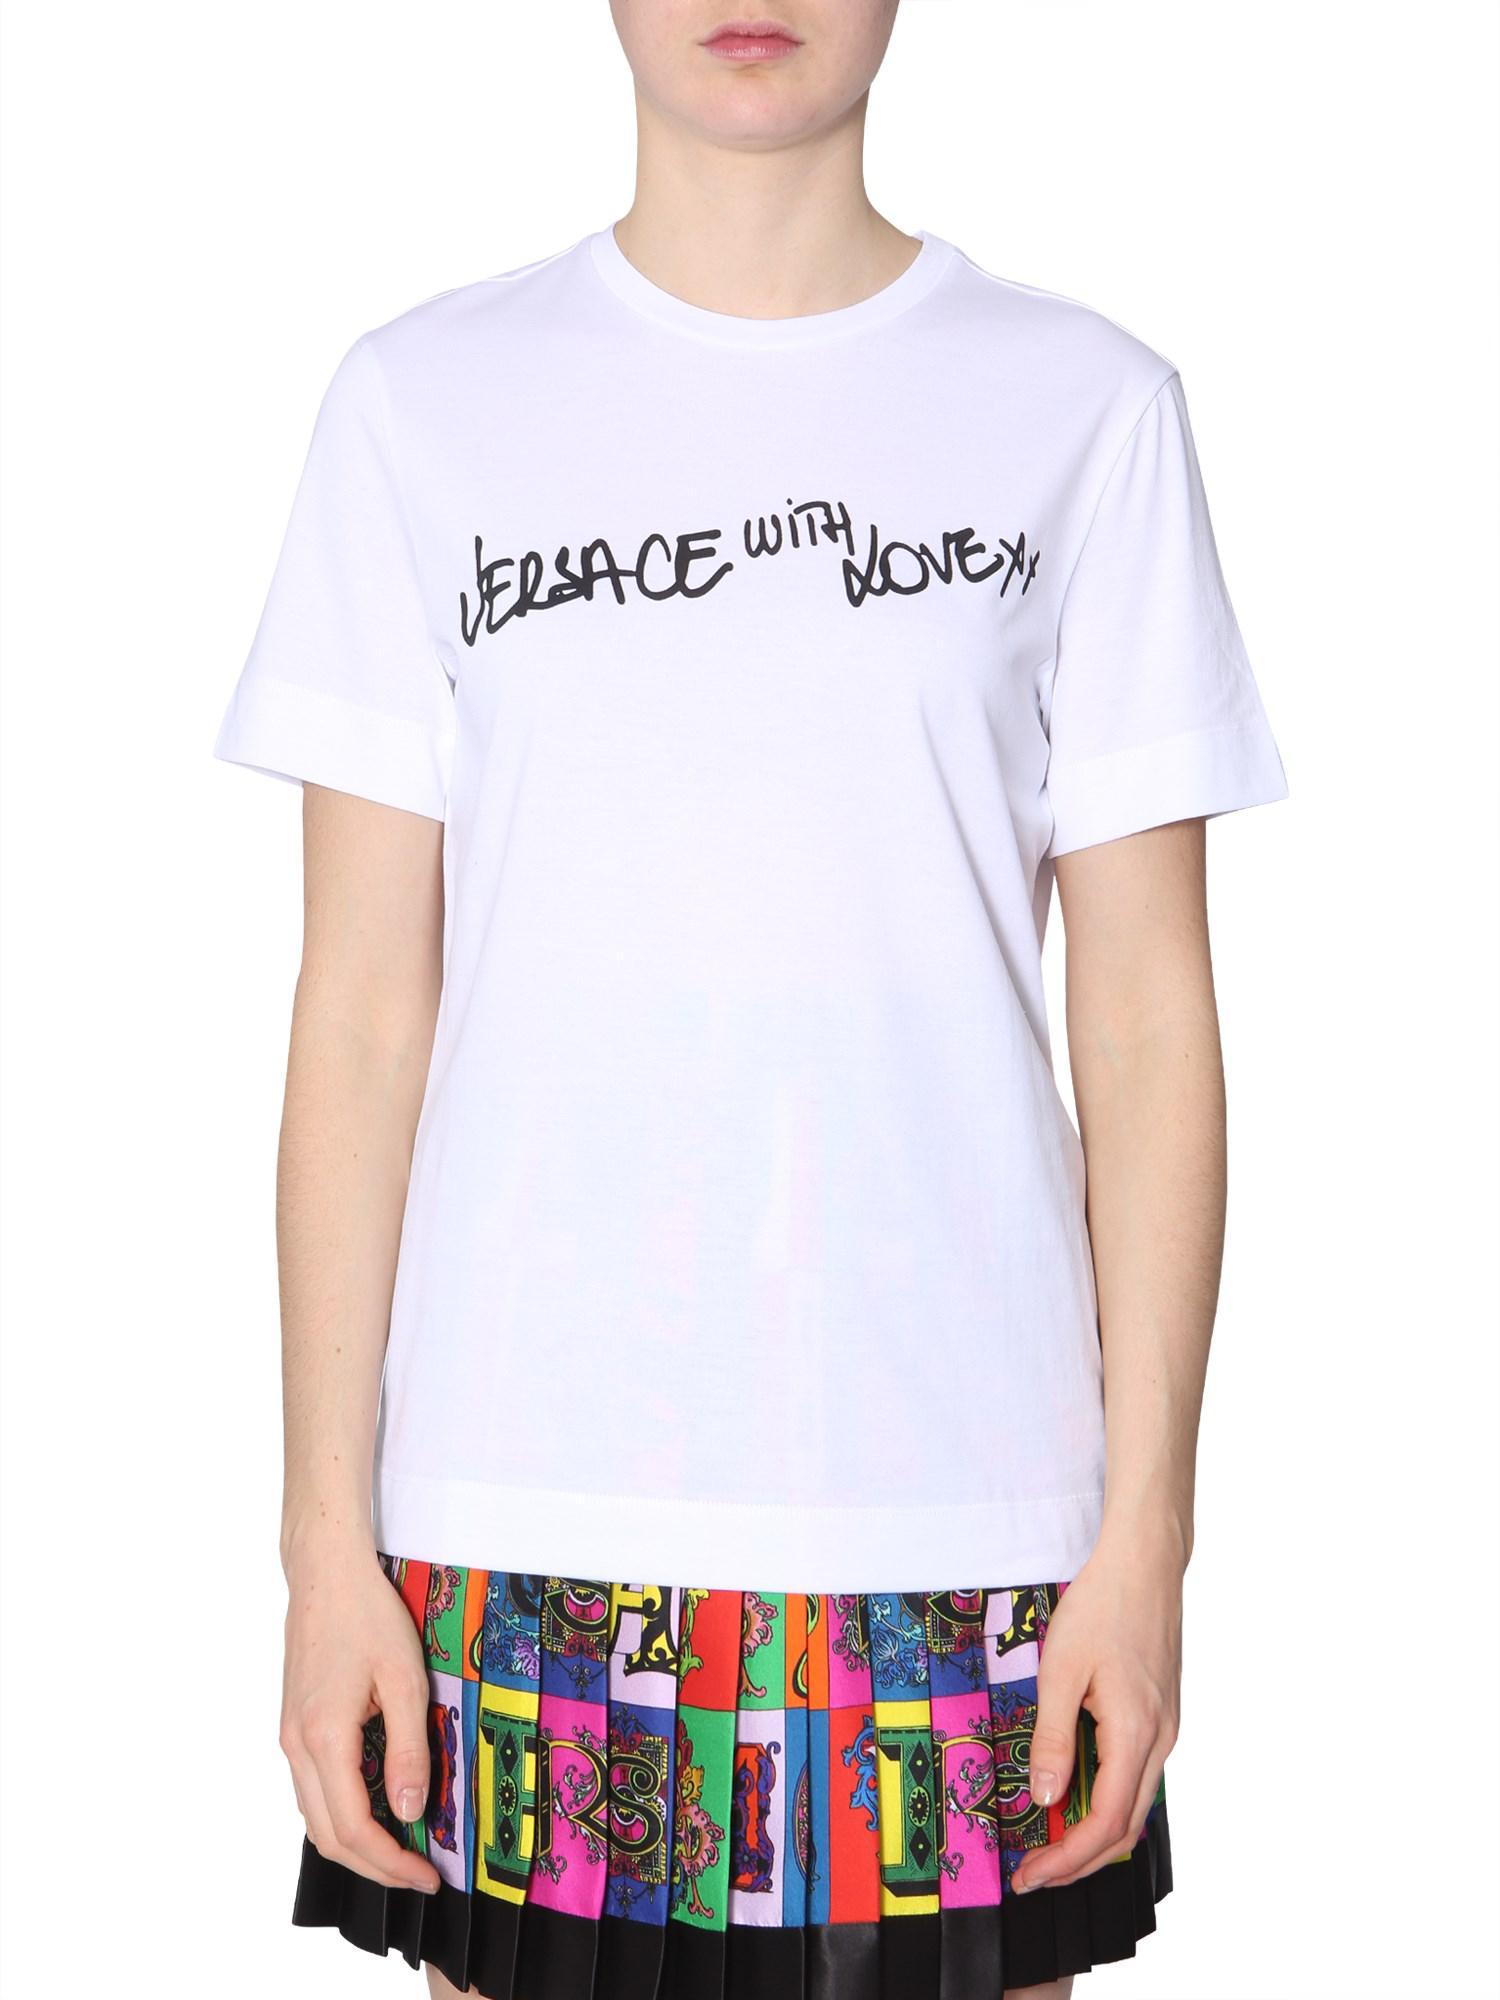 Lyst - Versace T-shirt Girocollo In Jersey Di Cotone Con Stampa in White 3dc3bc42042f